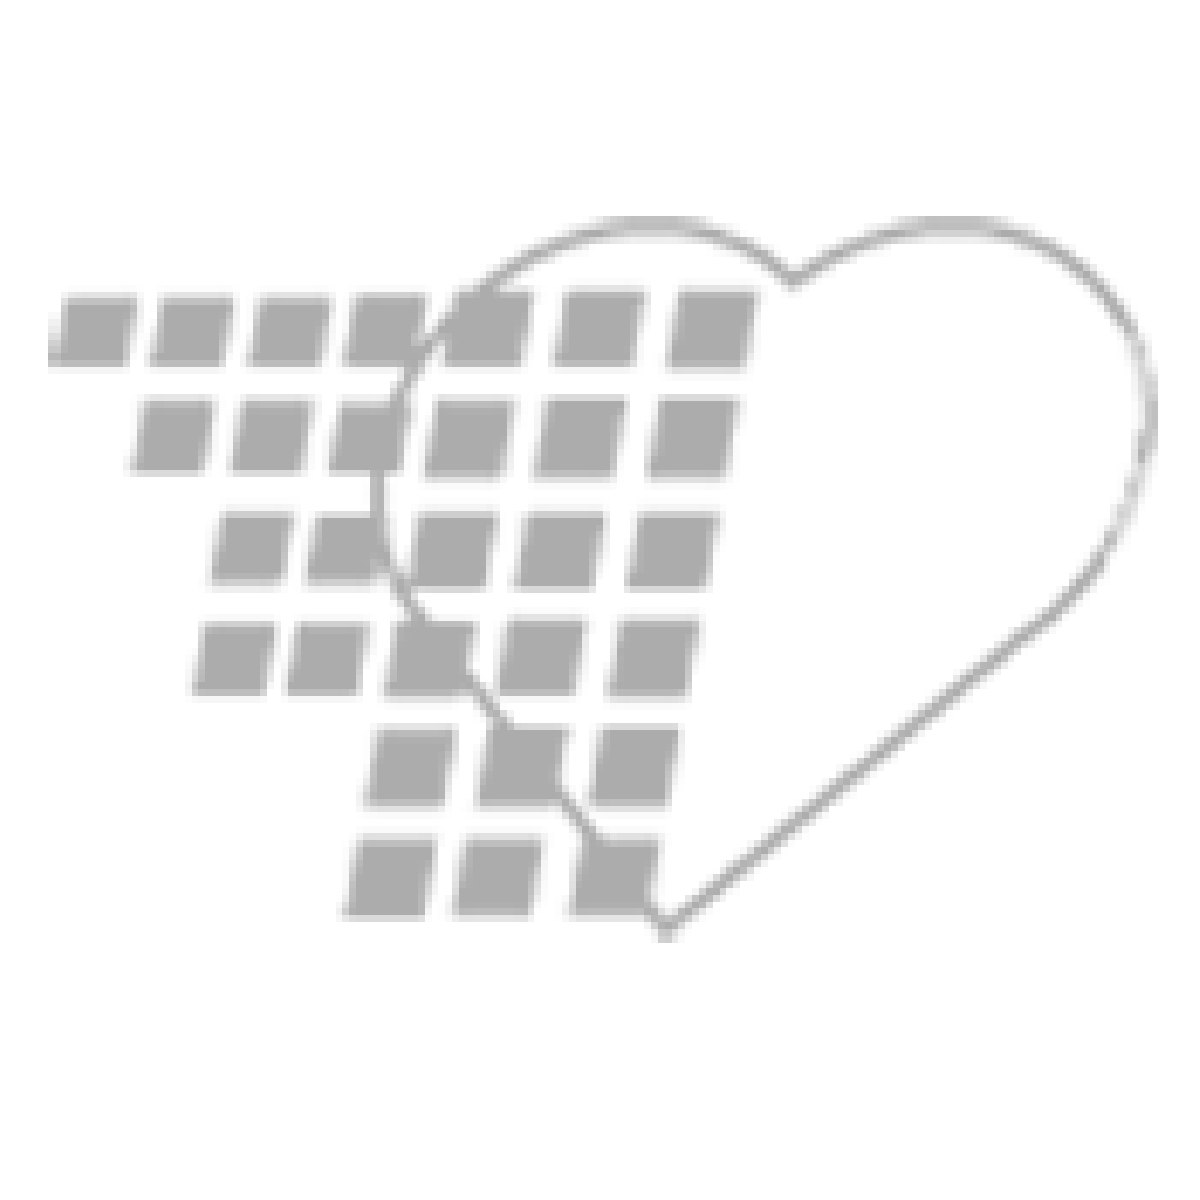 06-93-1356 Demo Dose® Lidocain Hydrochlorid 2% in 100mL - 4oz Bottle